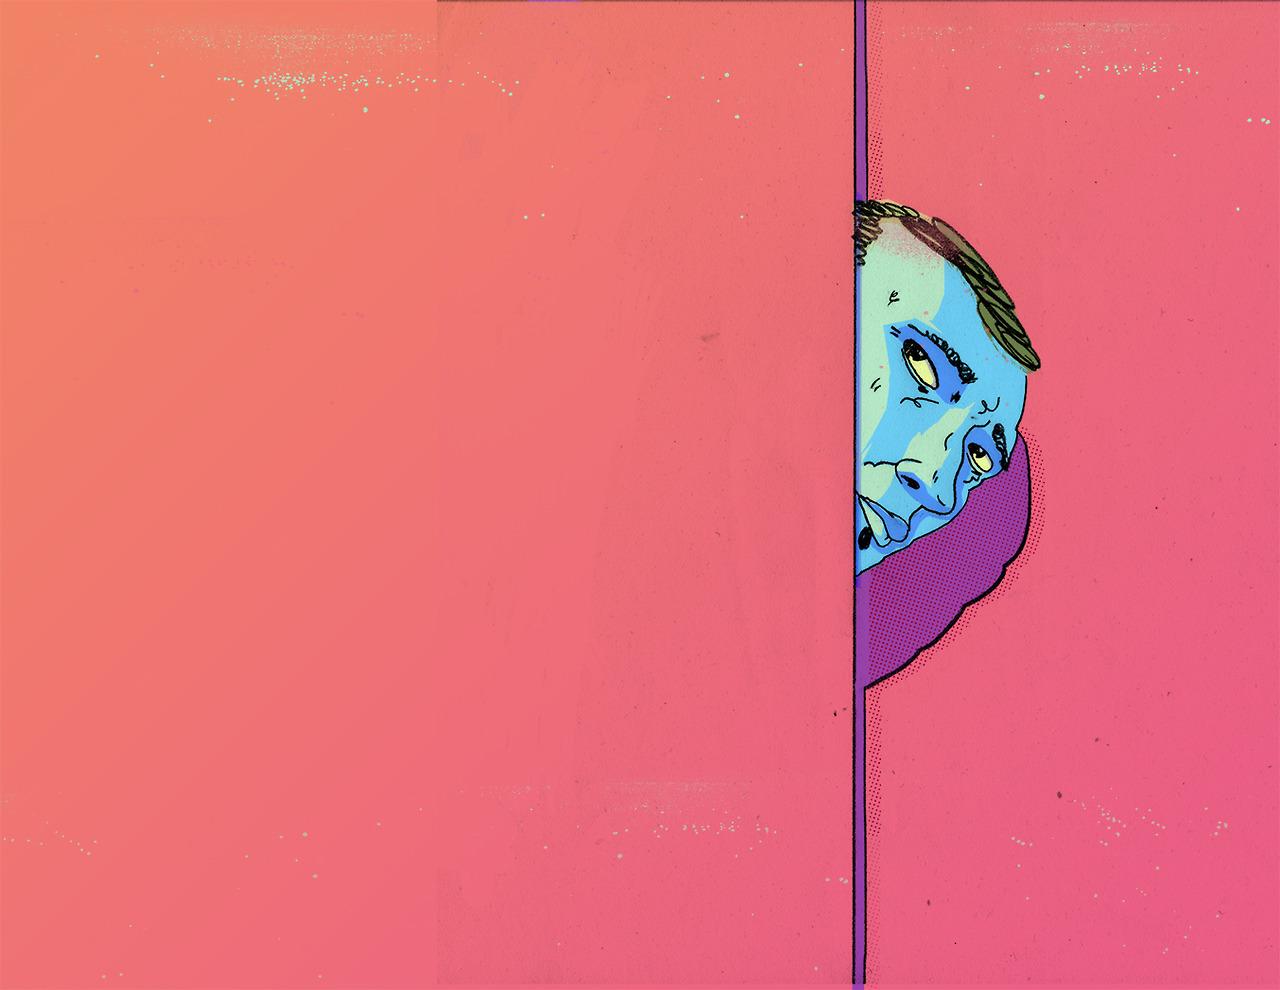 Peekaboo - Final Image.